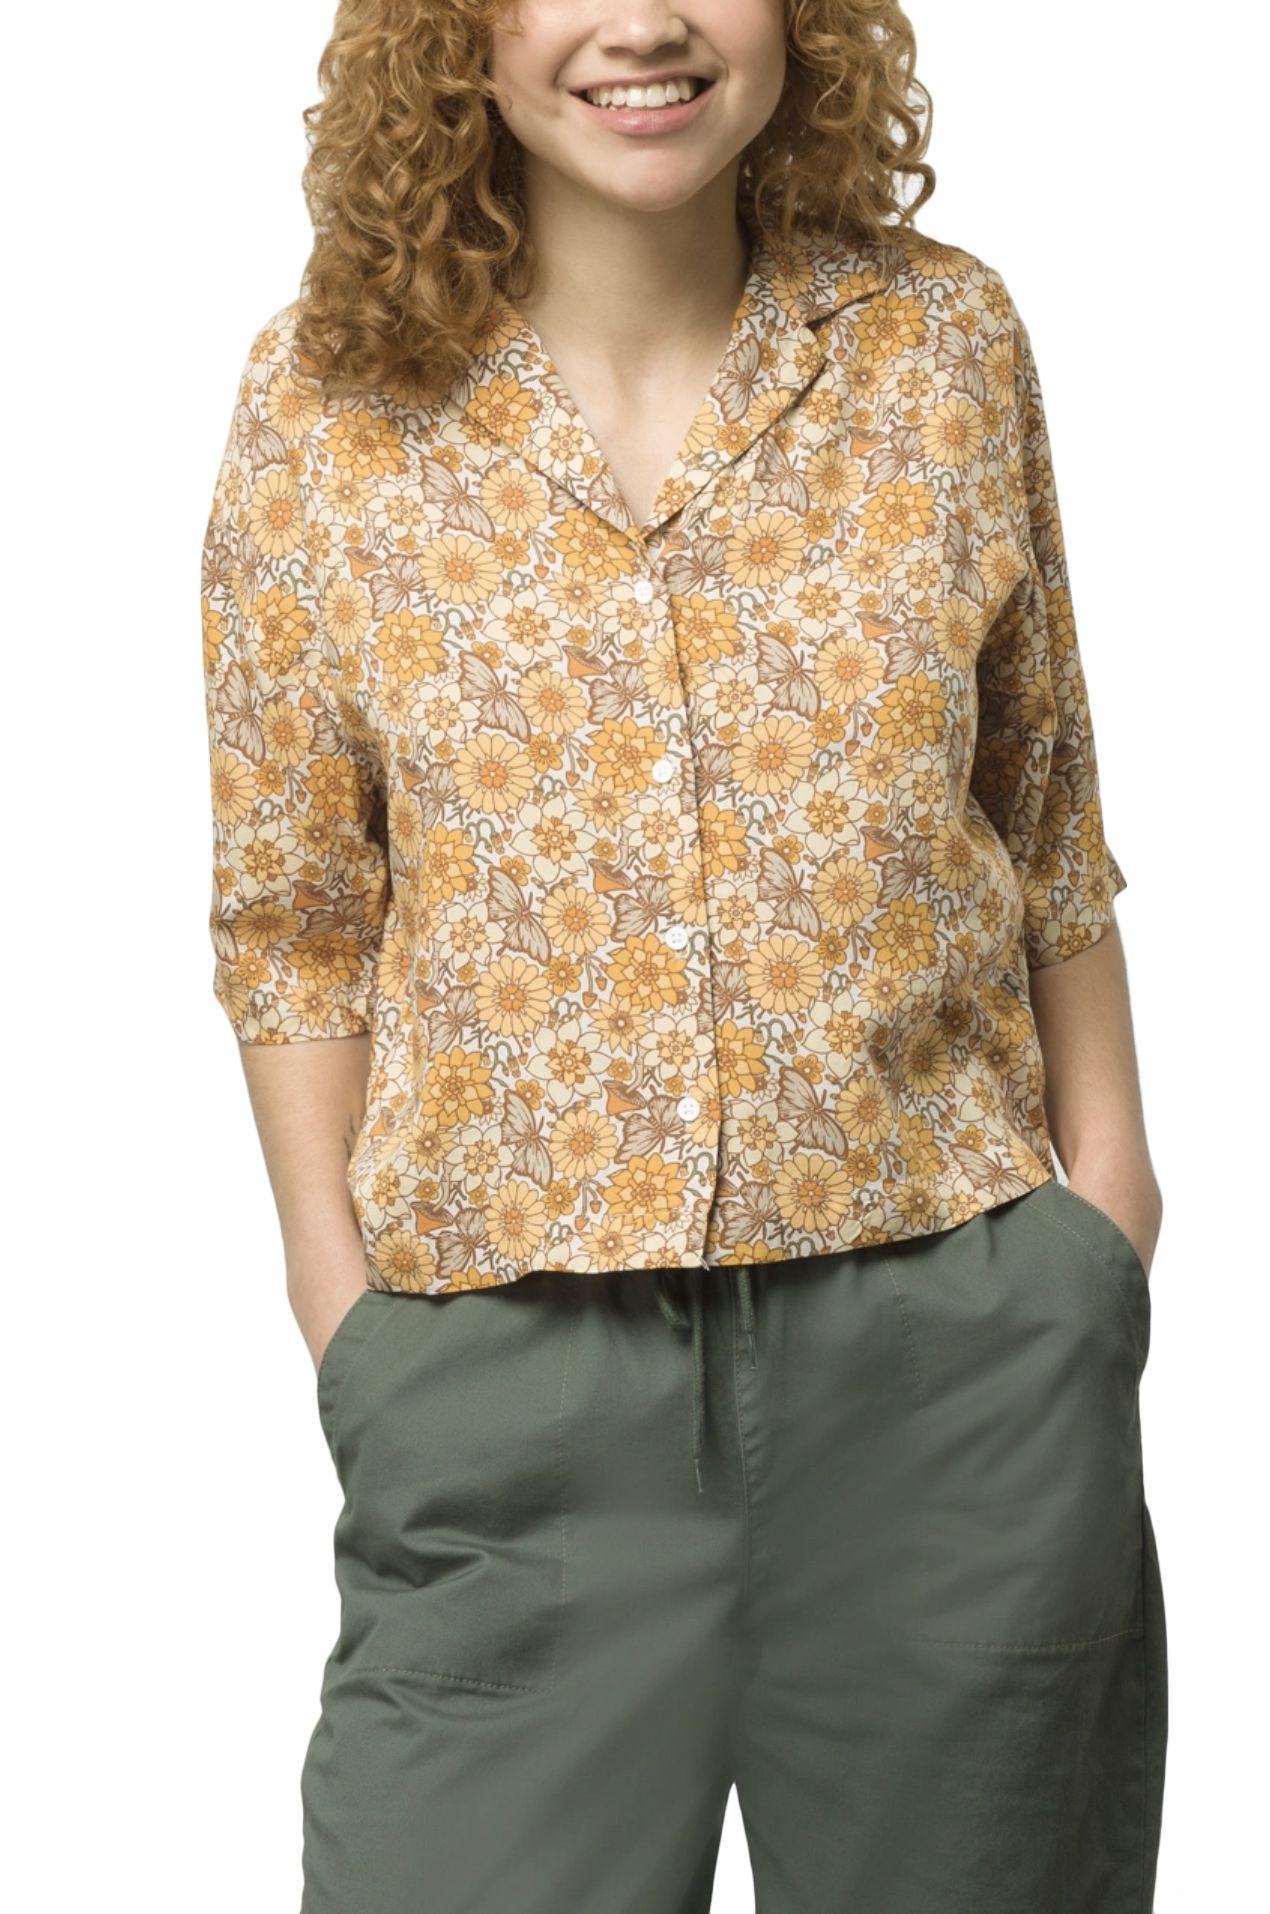 Vans Shirt TRIPPY FLORAL Trippy Floral